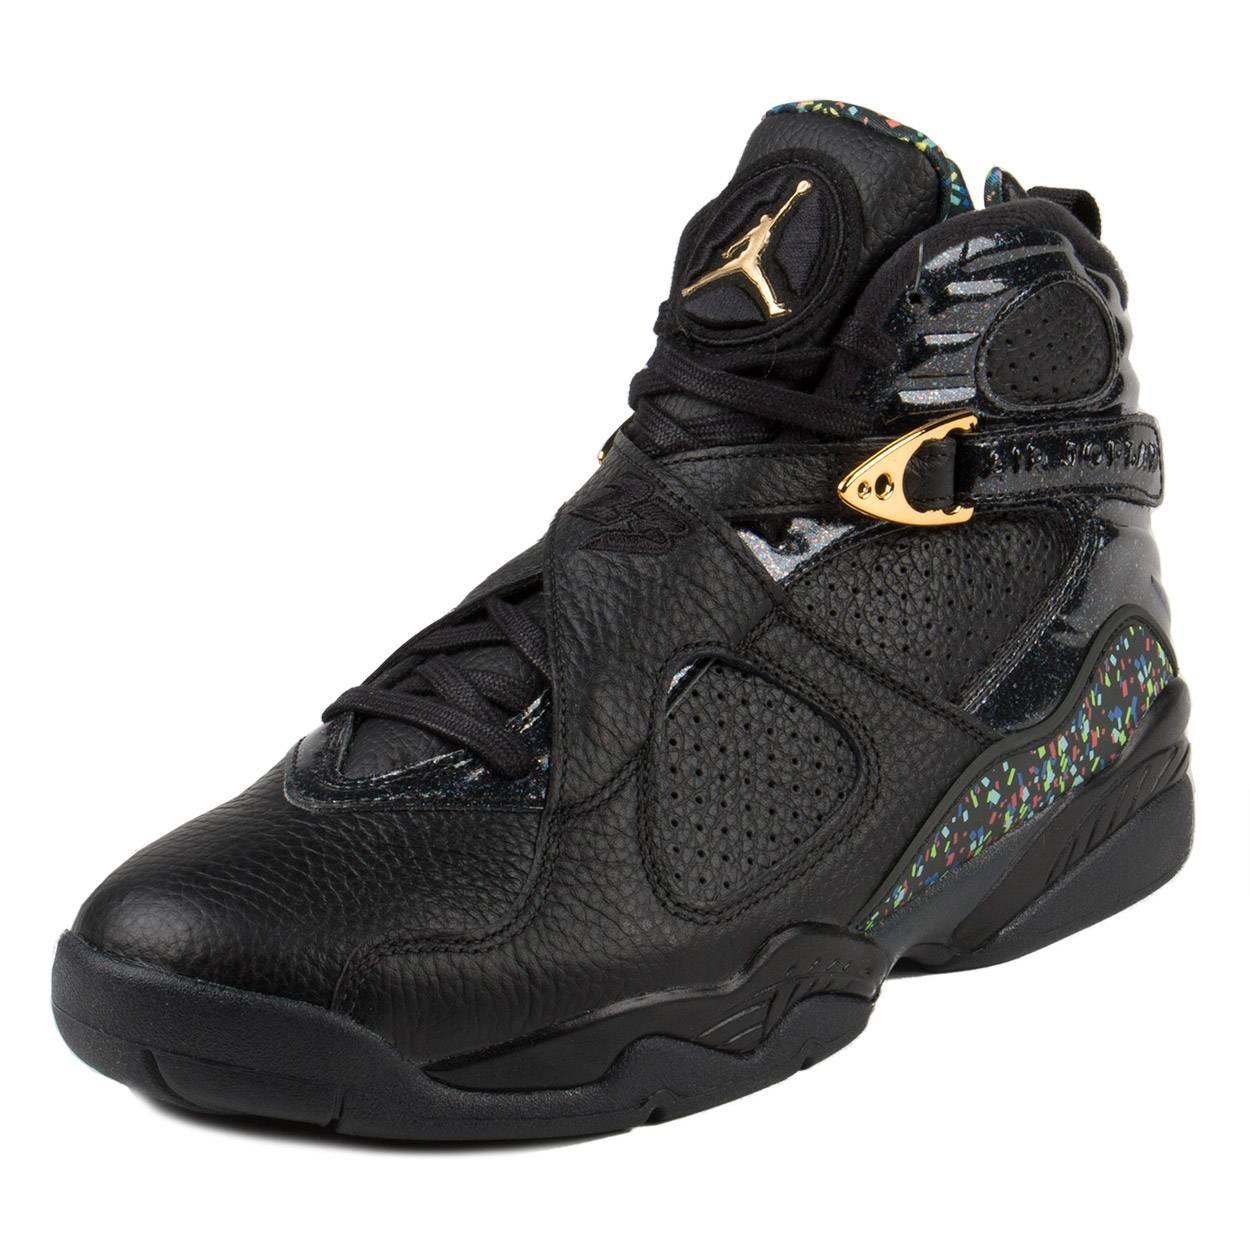 Nike Mens Air Jordan 8 Retro C&C Black/Metallic Gold Leather Size 12 by Nike